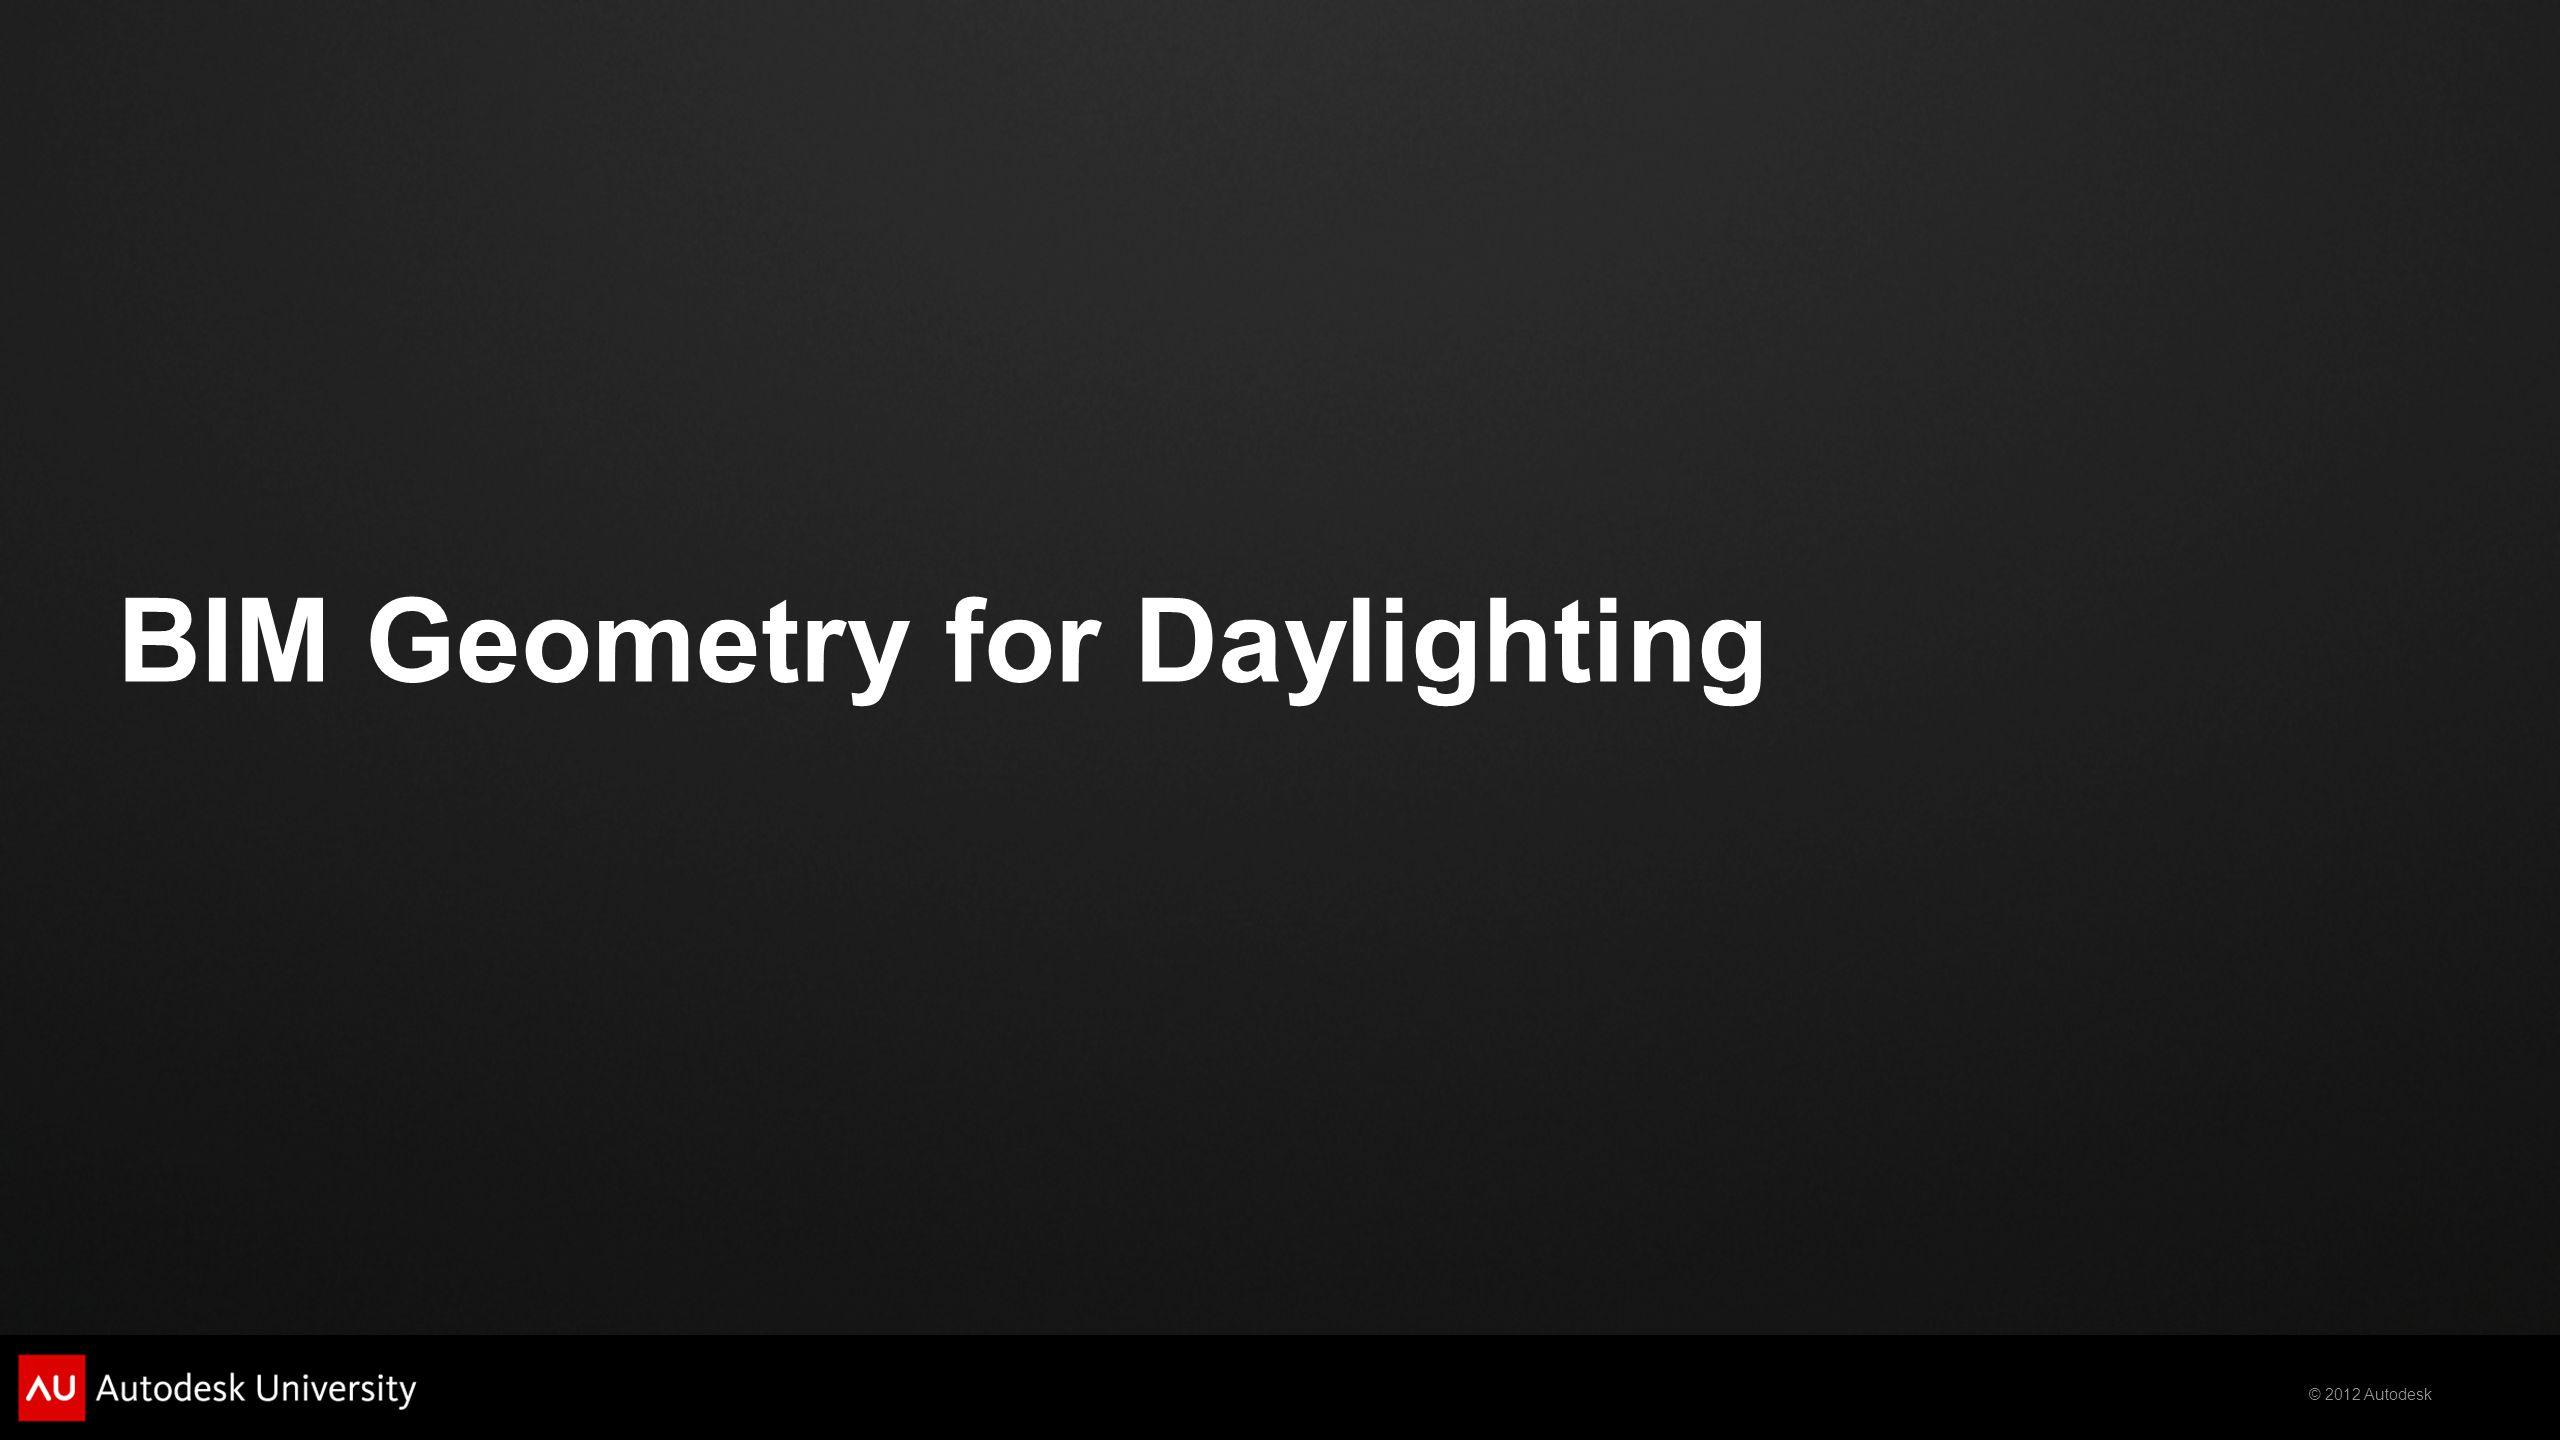 BIM Geometry for Daylighting